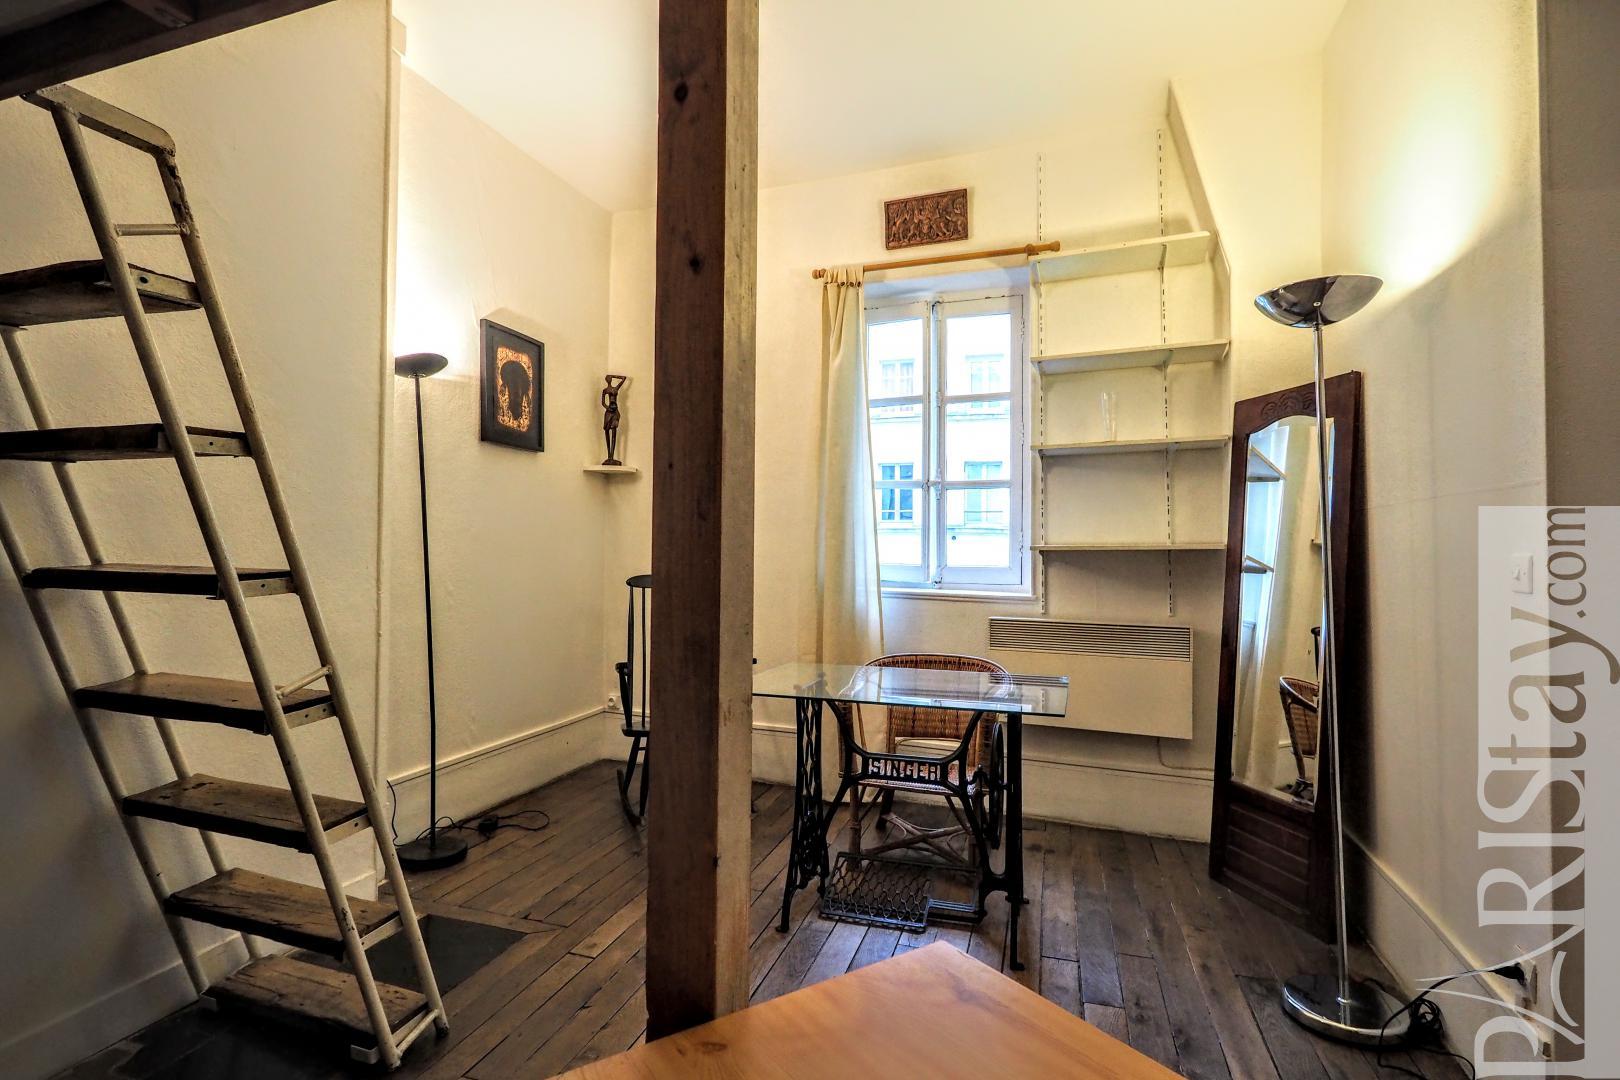 rentals in paris france furnished studio le marais place. Black Bedroom Furniture Sets. Home Design Ideas